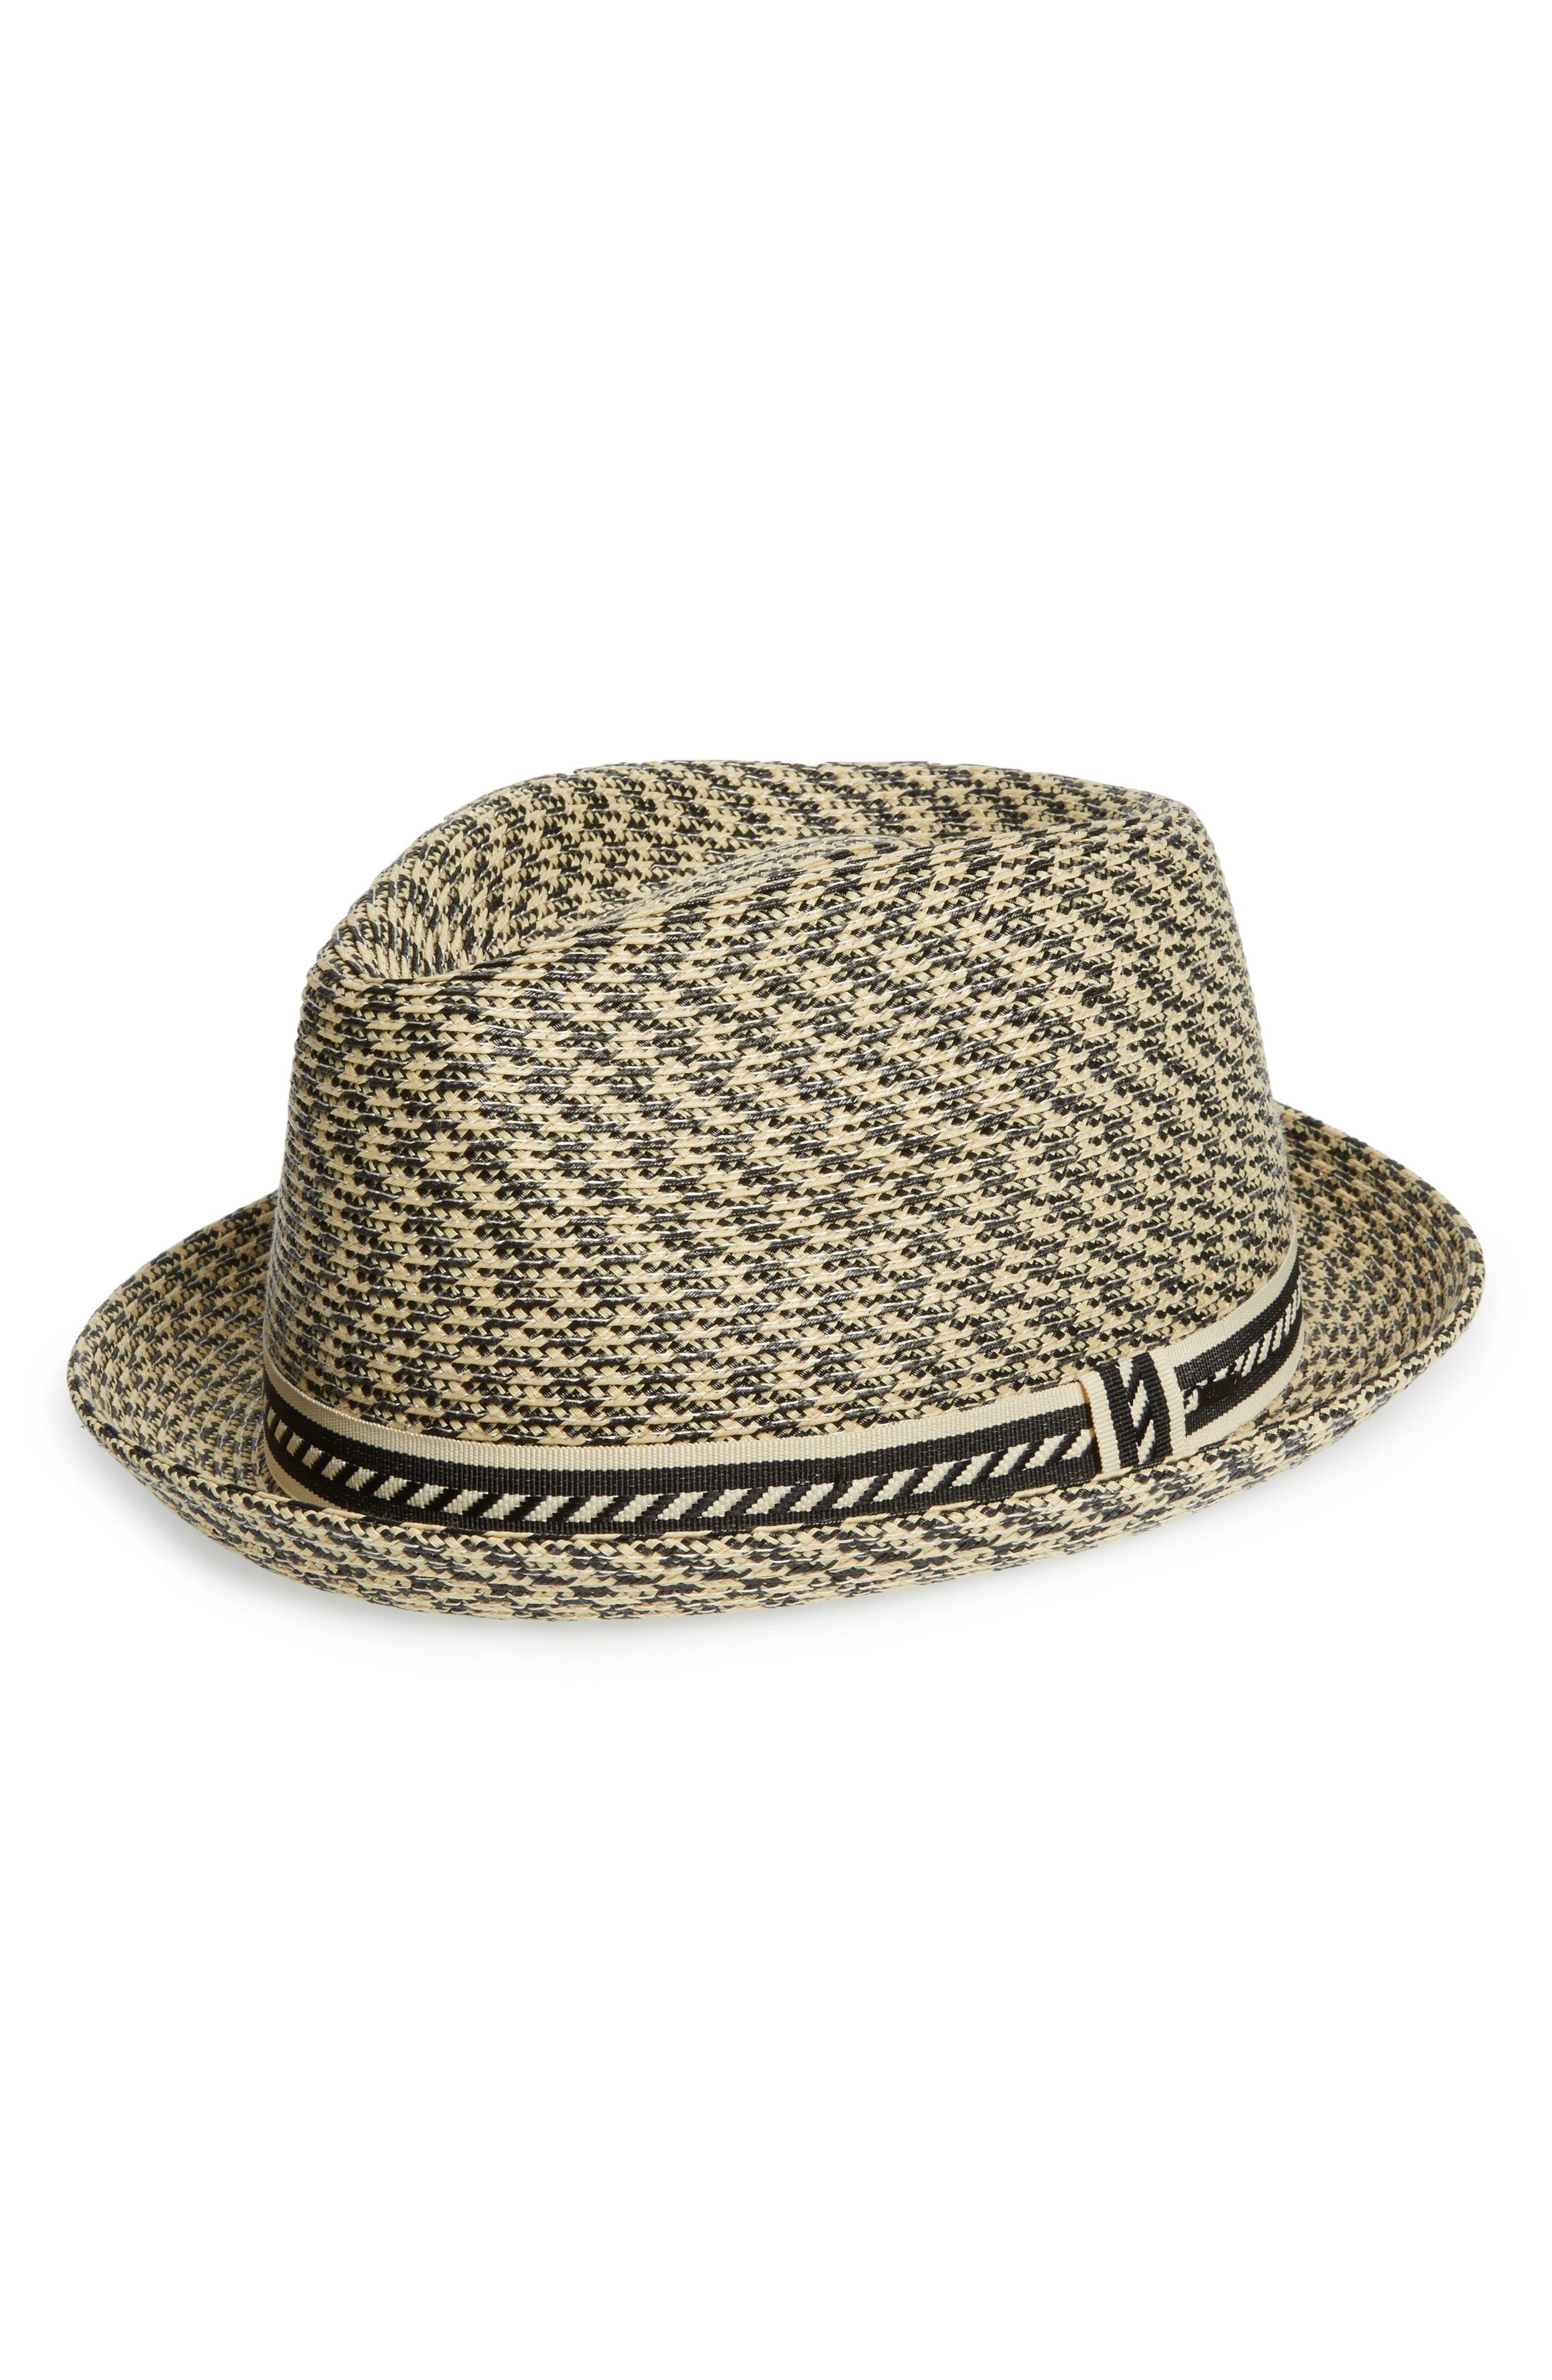 'Mannes' Hat